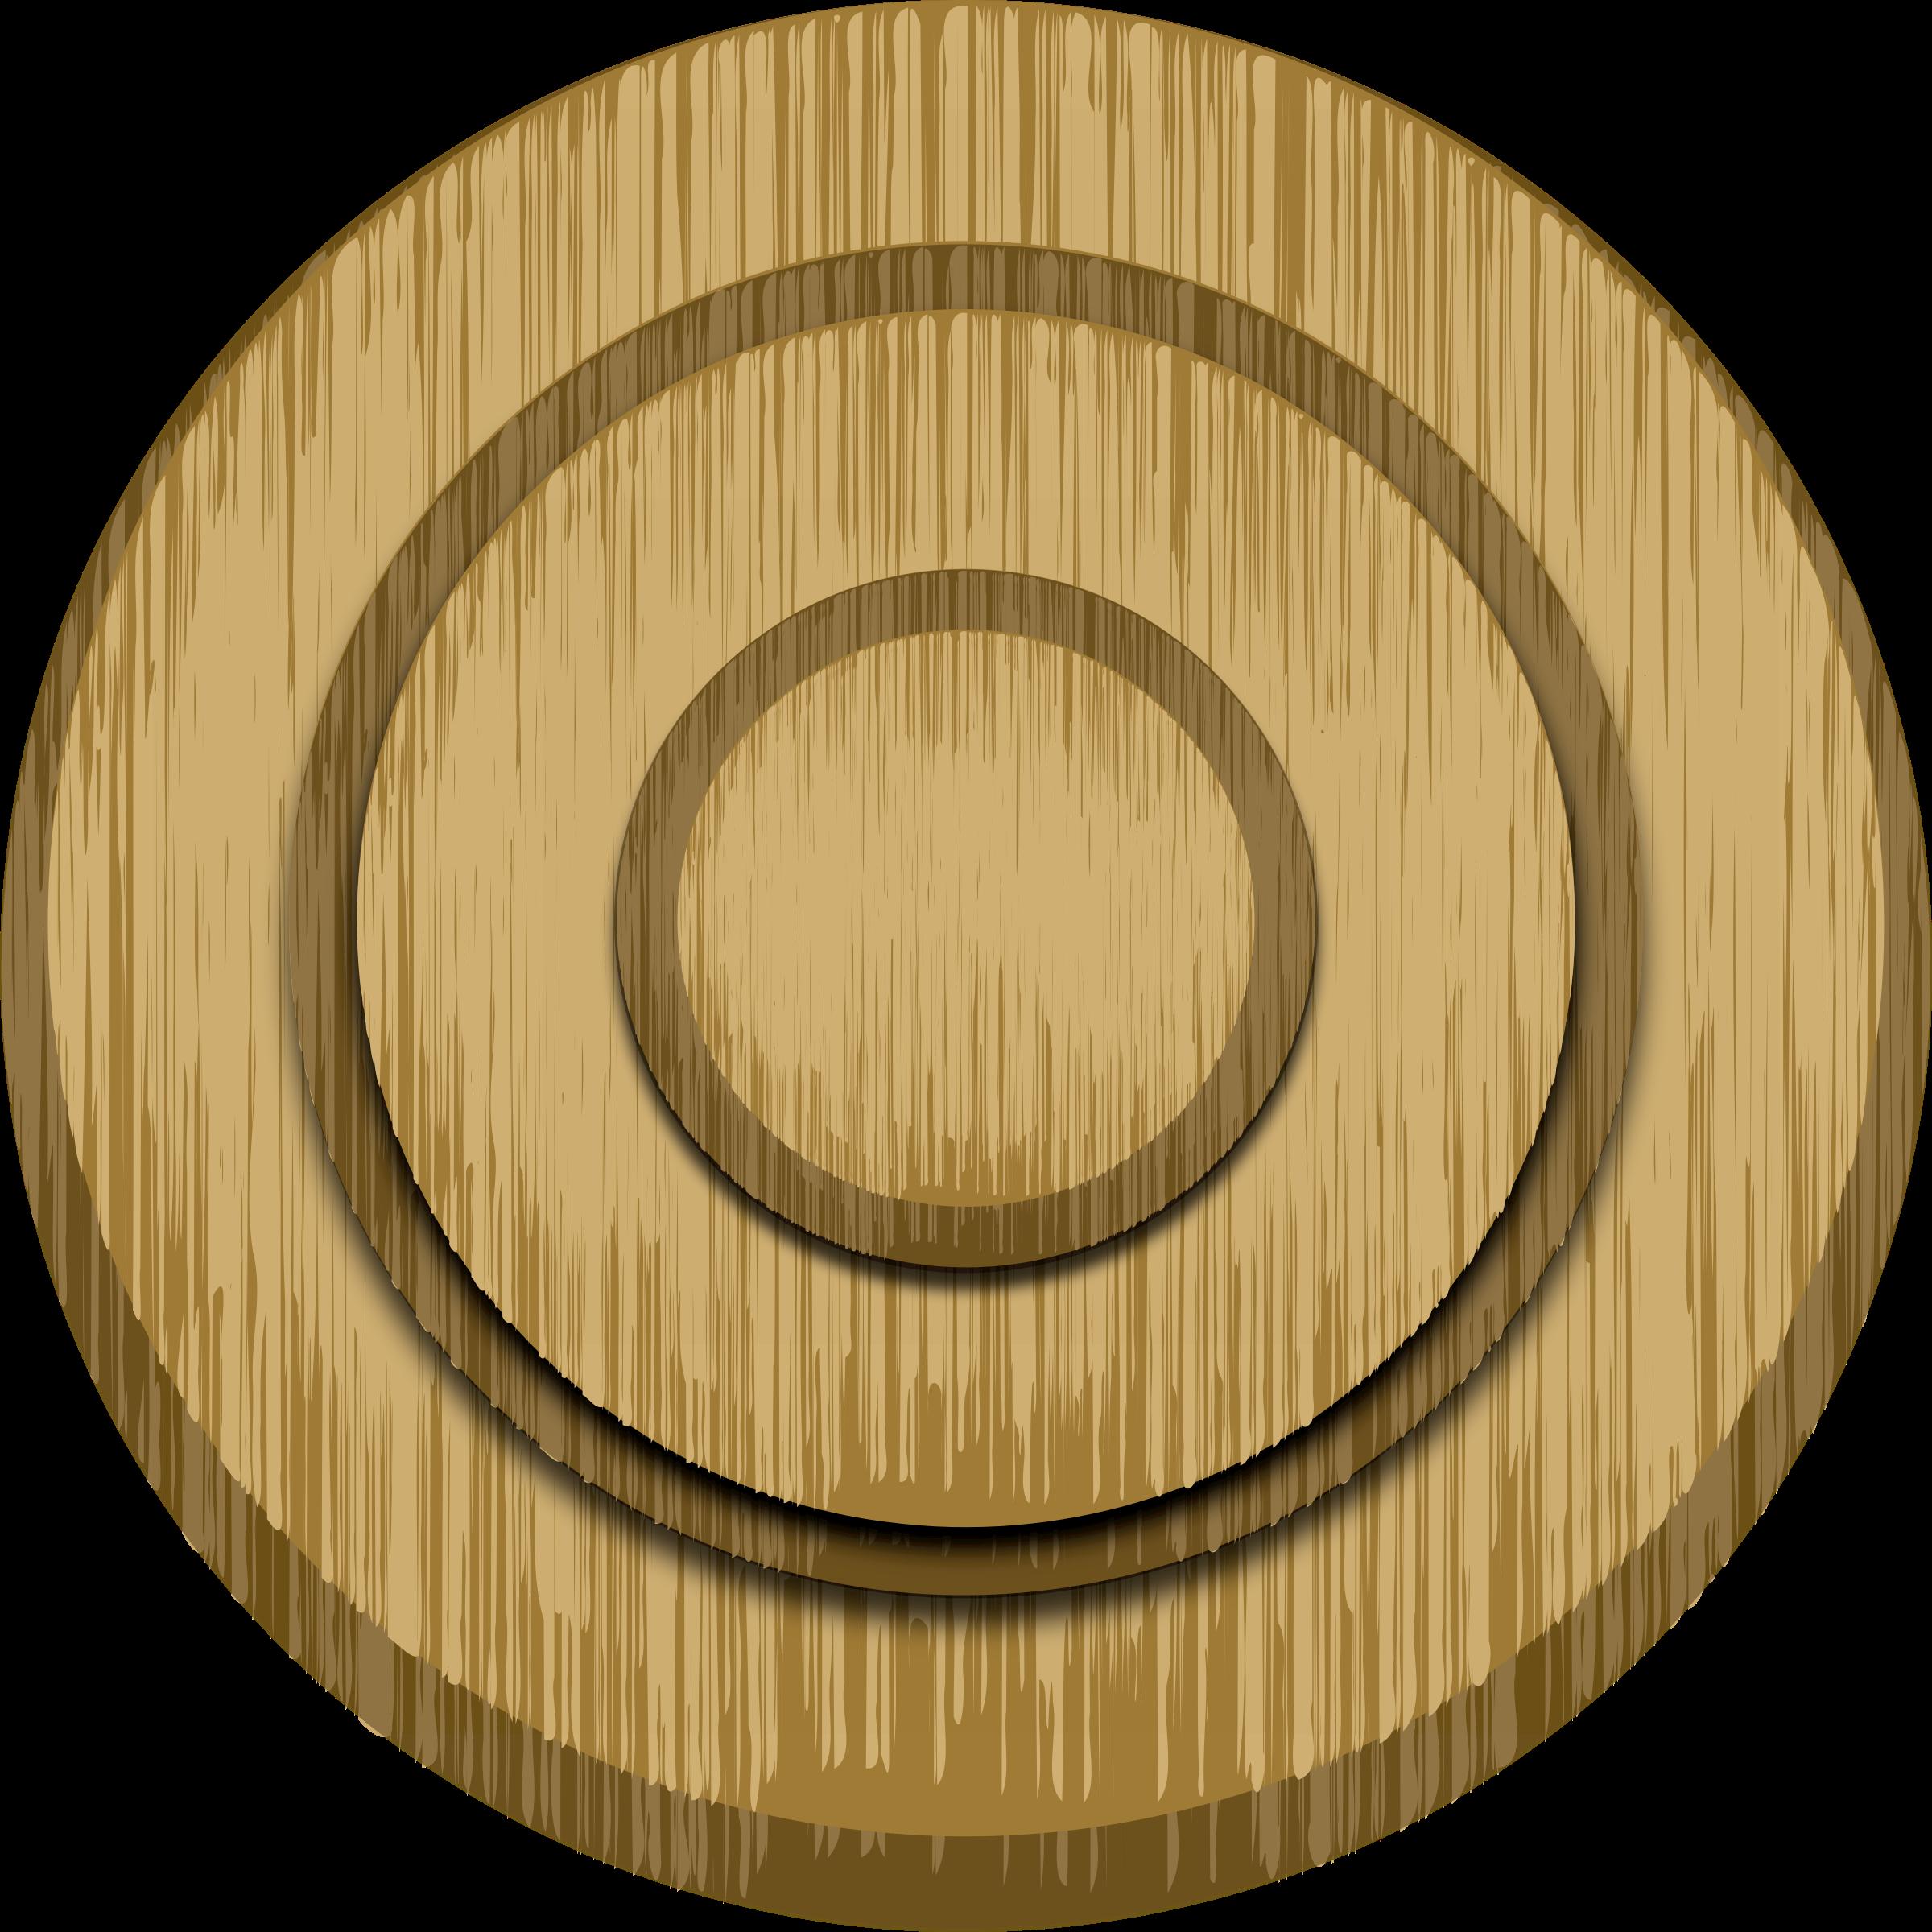 Firewood clipart fogata. Wood target